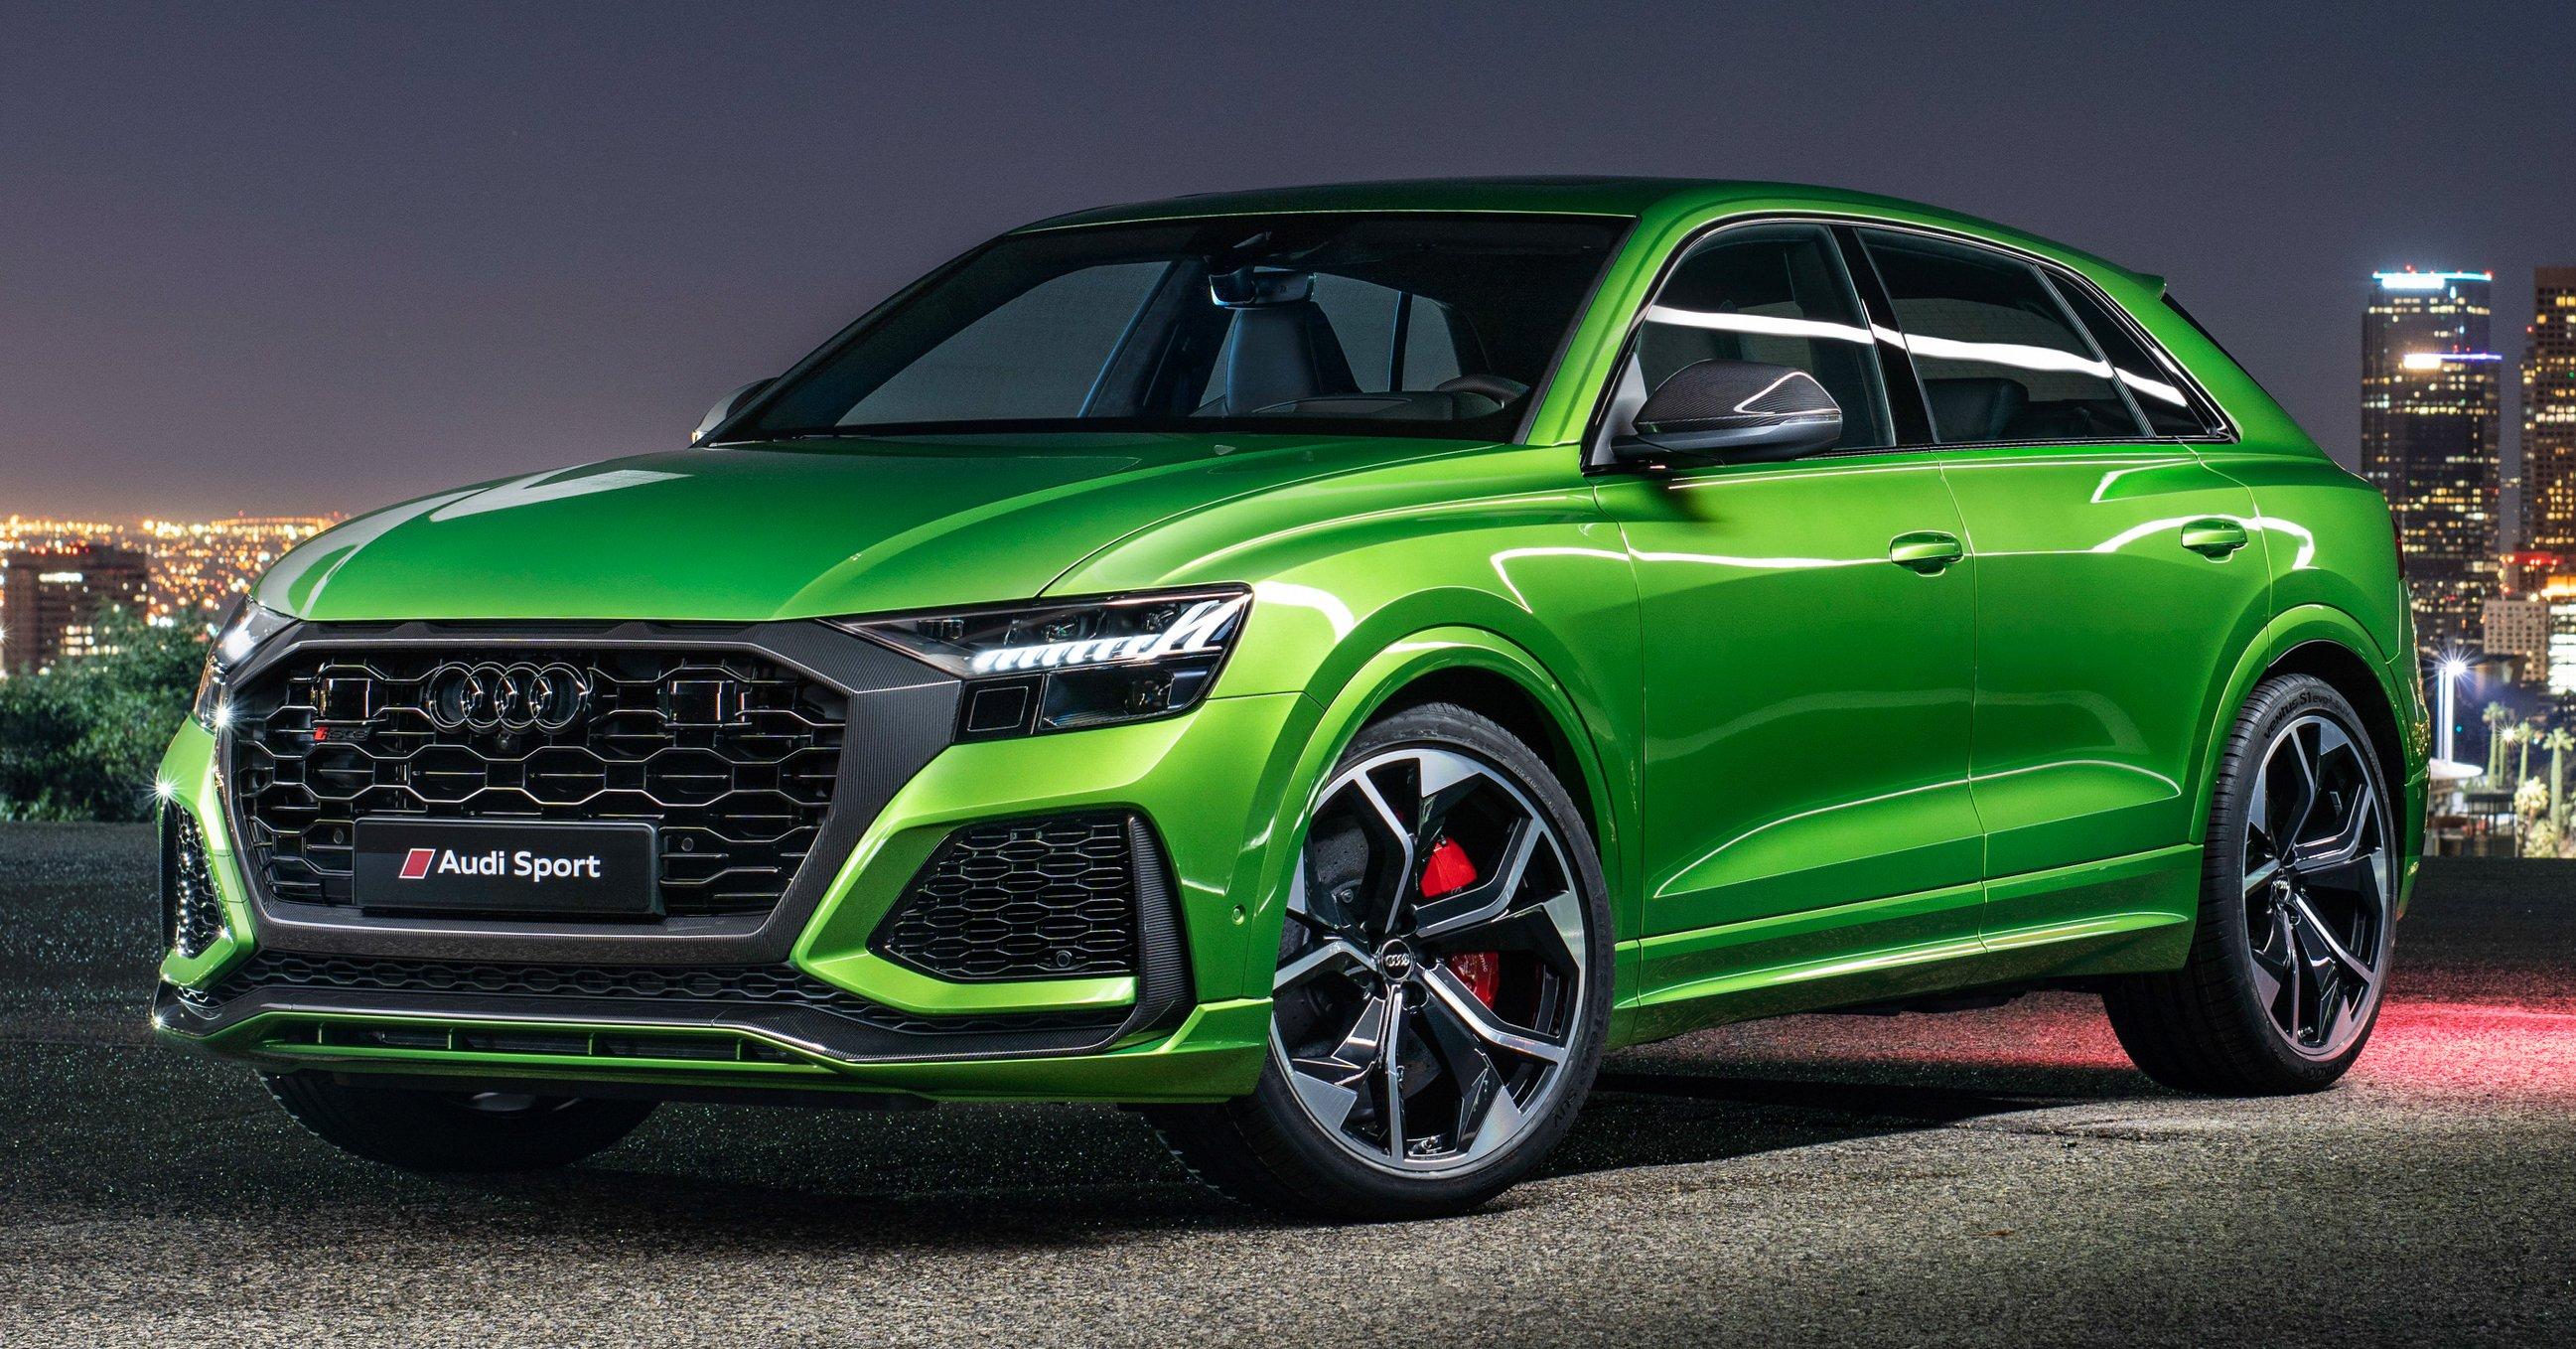 2020 Audi Rs Q8 Beastly 4 0l V8 600 Ps 800 Nm Paultan Org